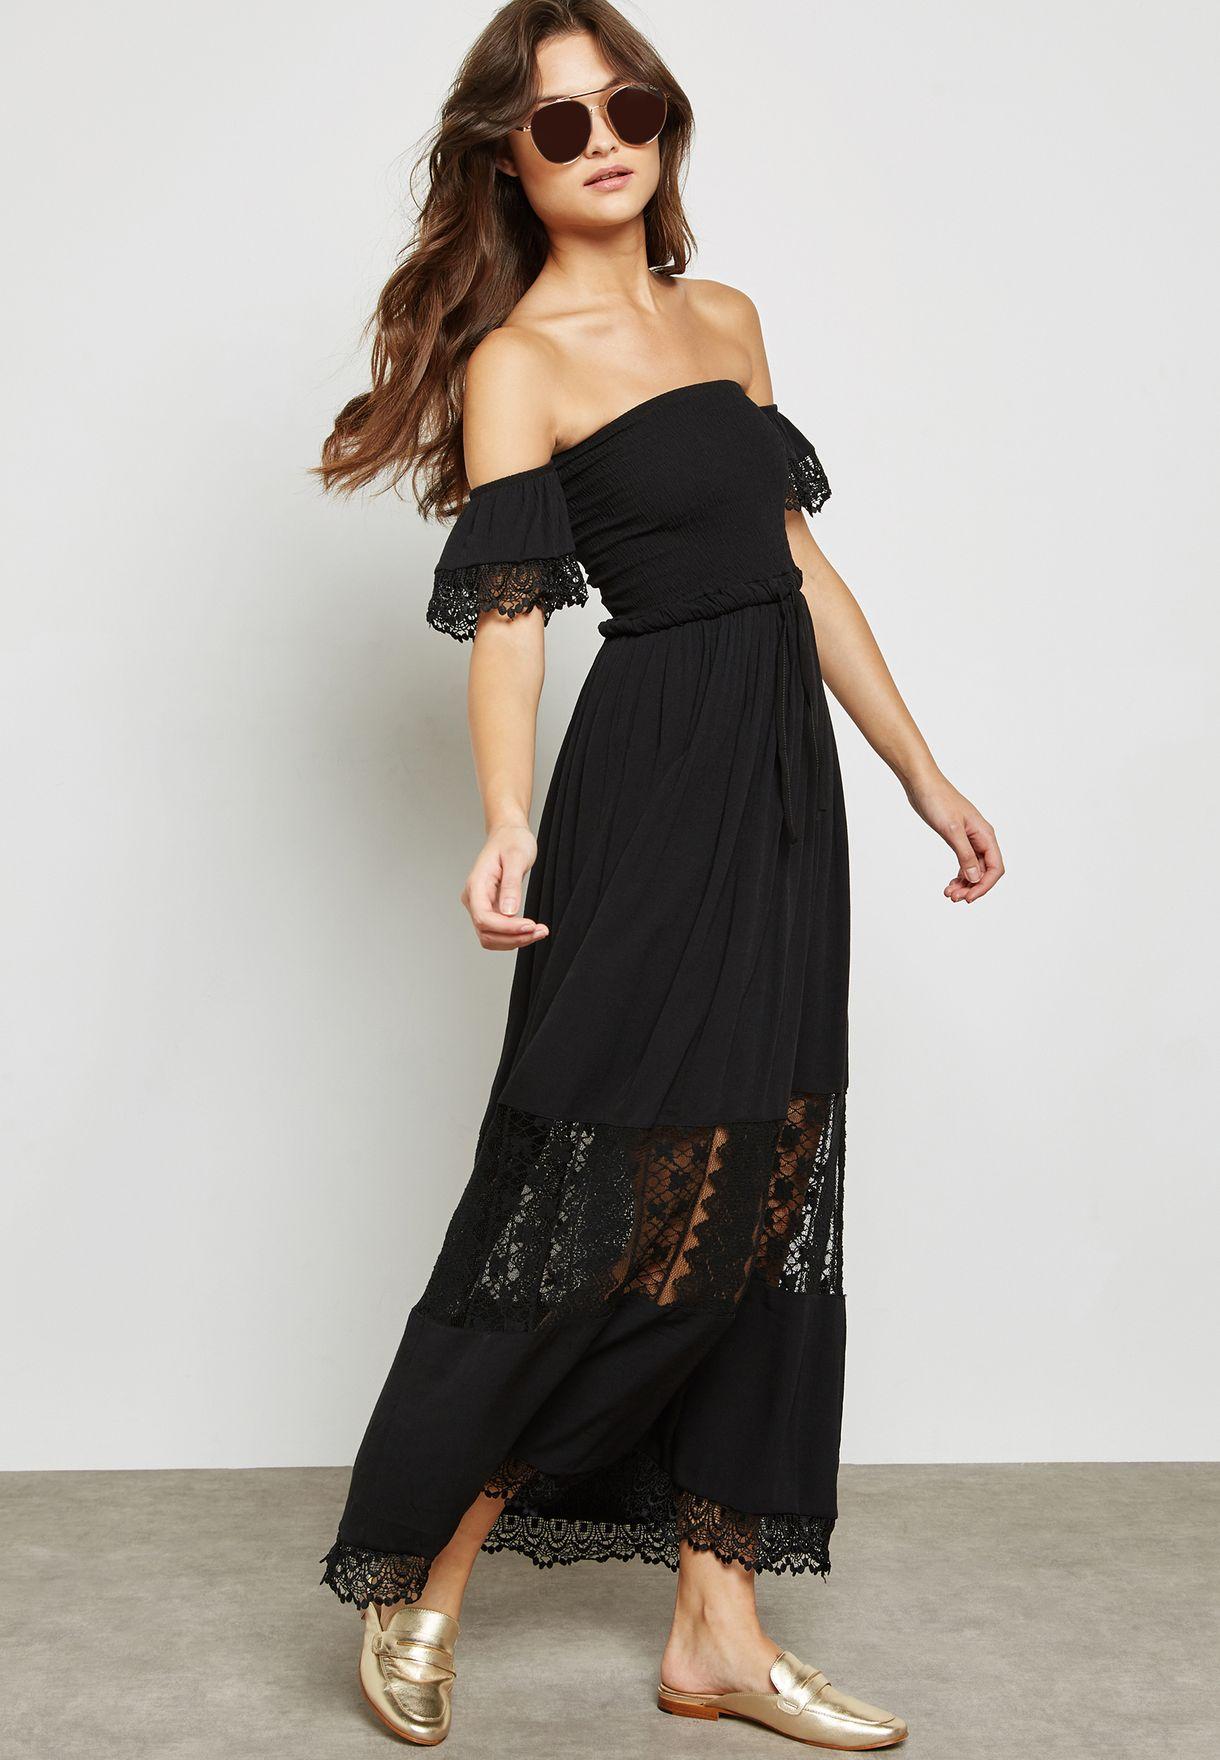 657580684d2 Shop Ginger black Lace Insert Bardot Bandeau Maxi Dress 10701 for ...